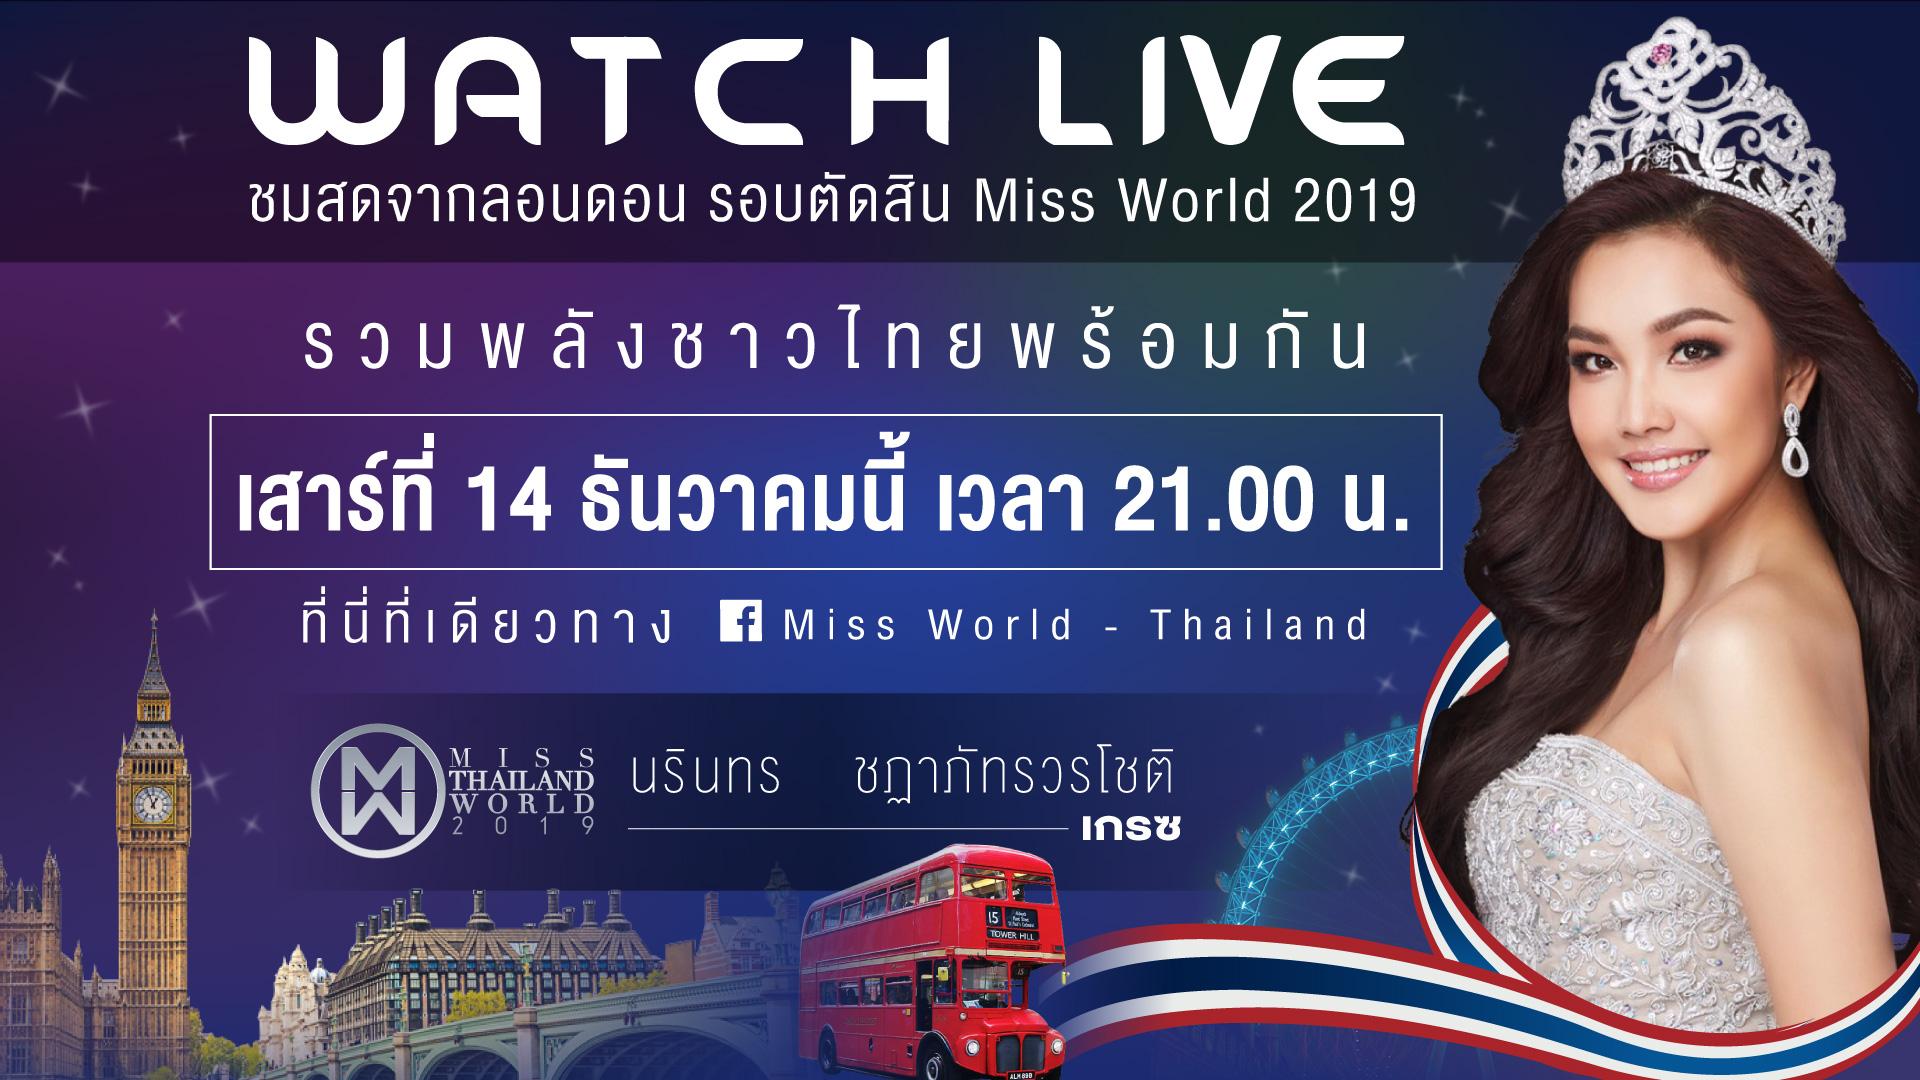 [Live] สดจาก #London รอบตัดสิน Miss World 2019 รวมพลังชาวไทยให้กำลังใจ เกรซ-นรินทร กันที่นี่!!!!